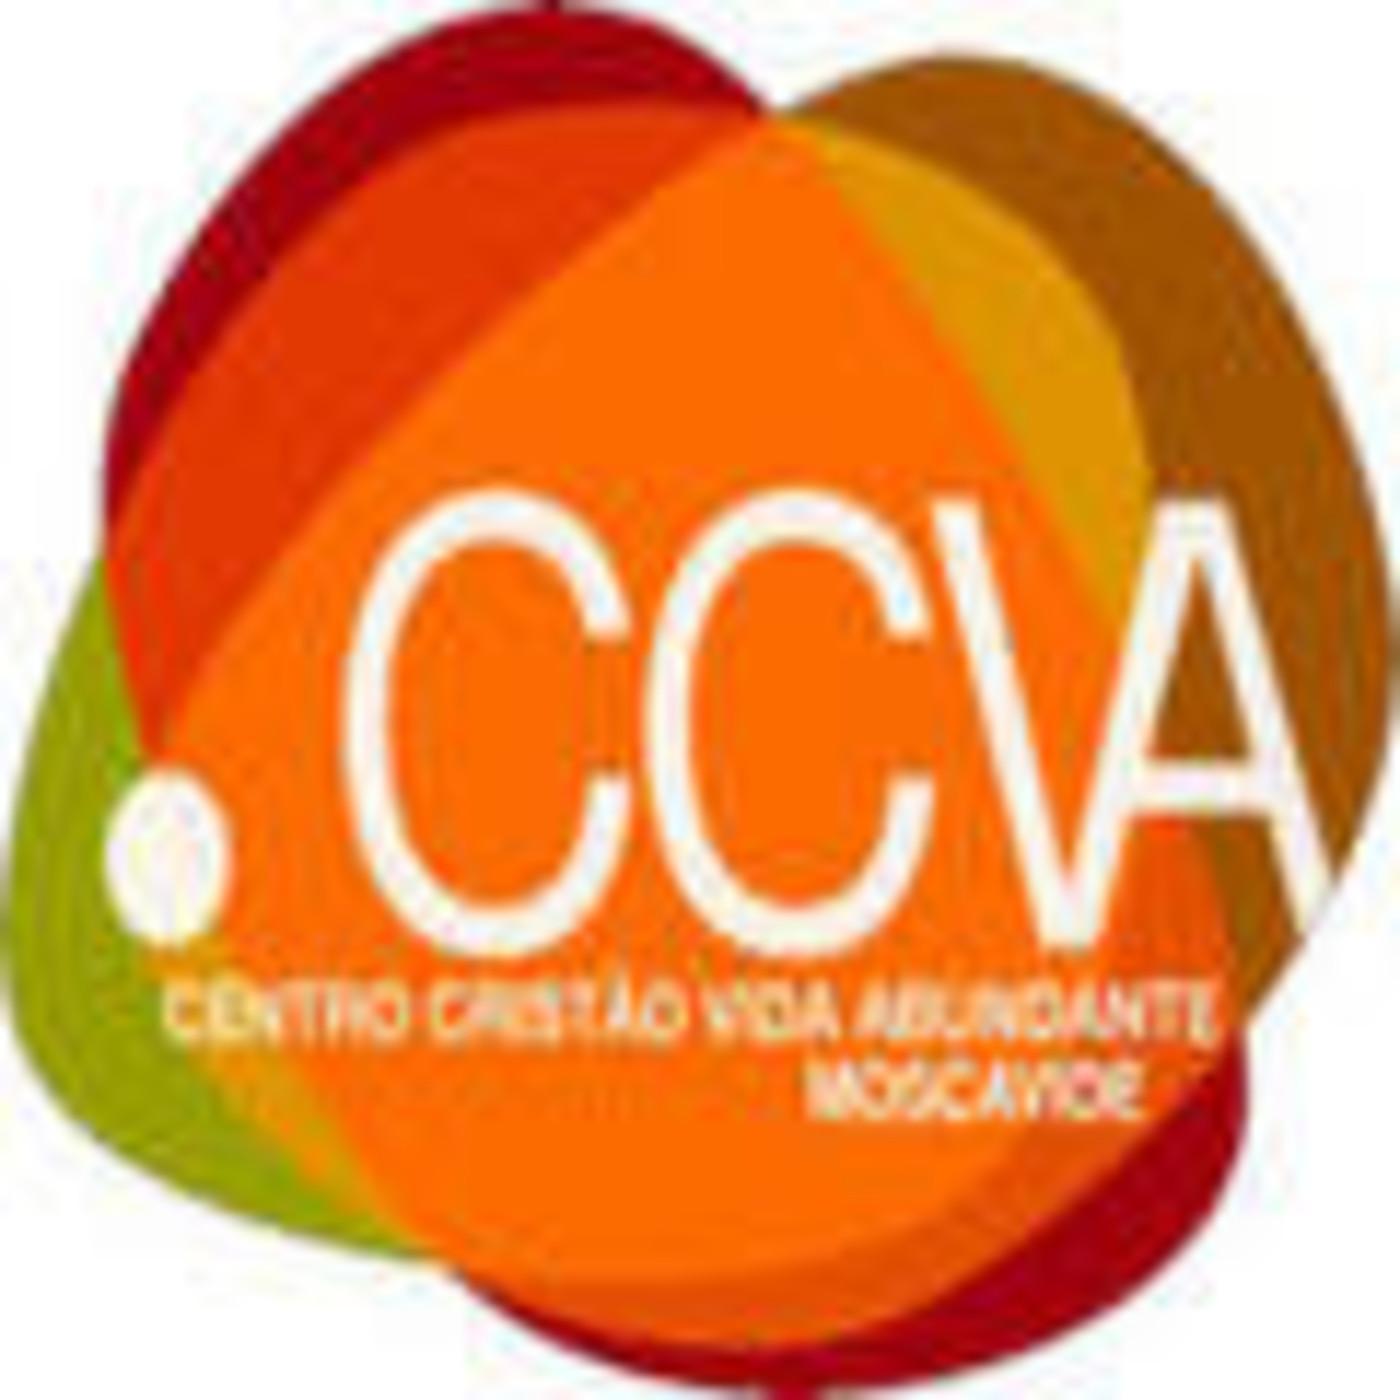 ccvamoscavide.org